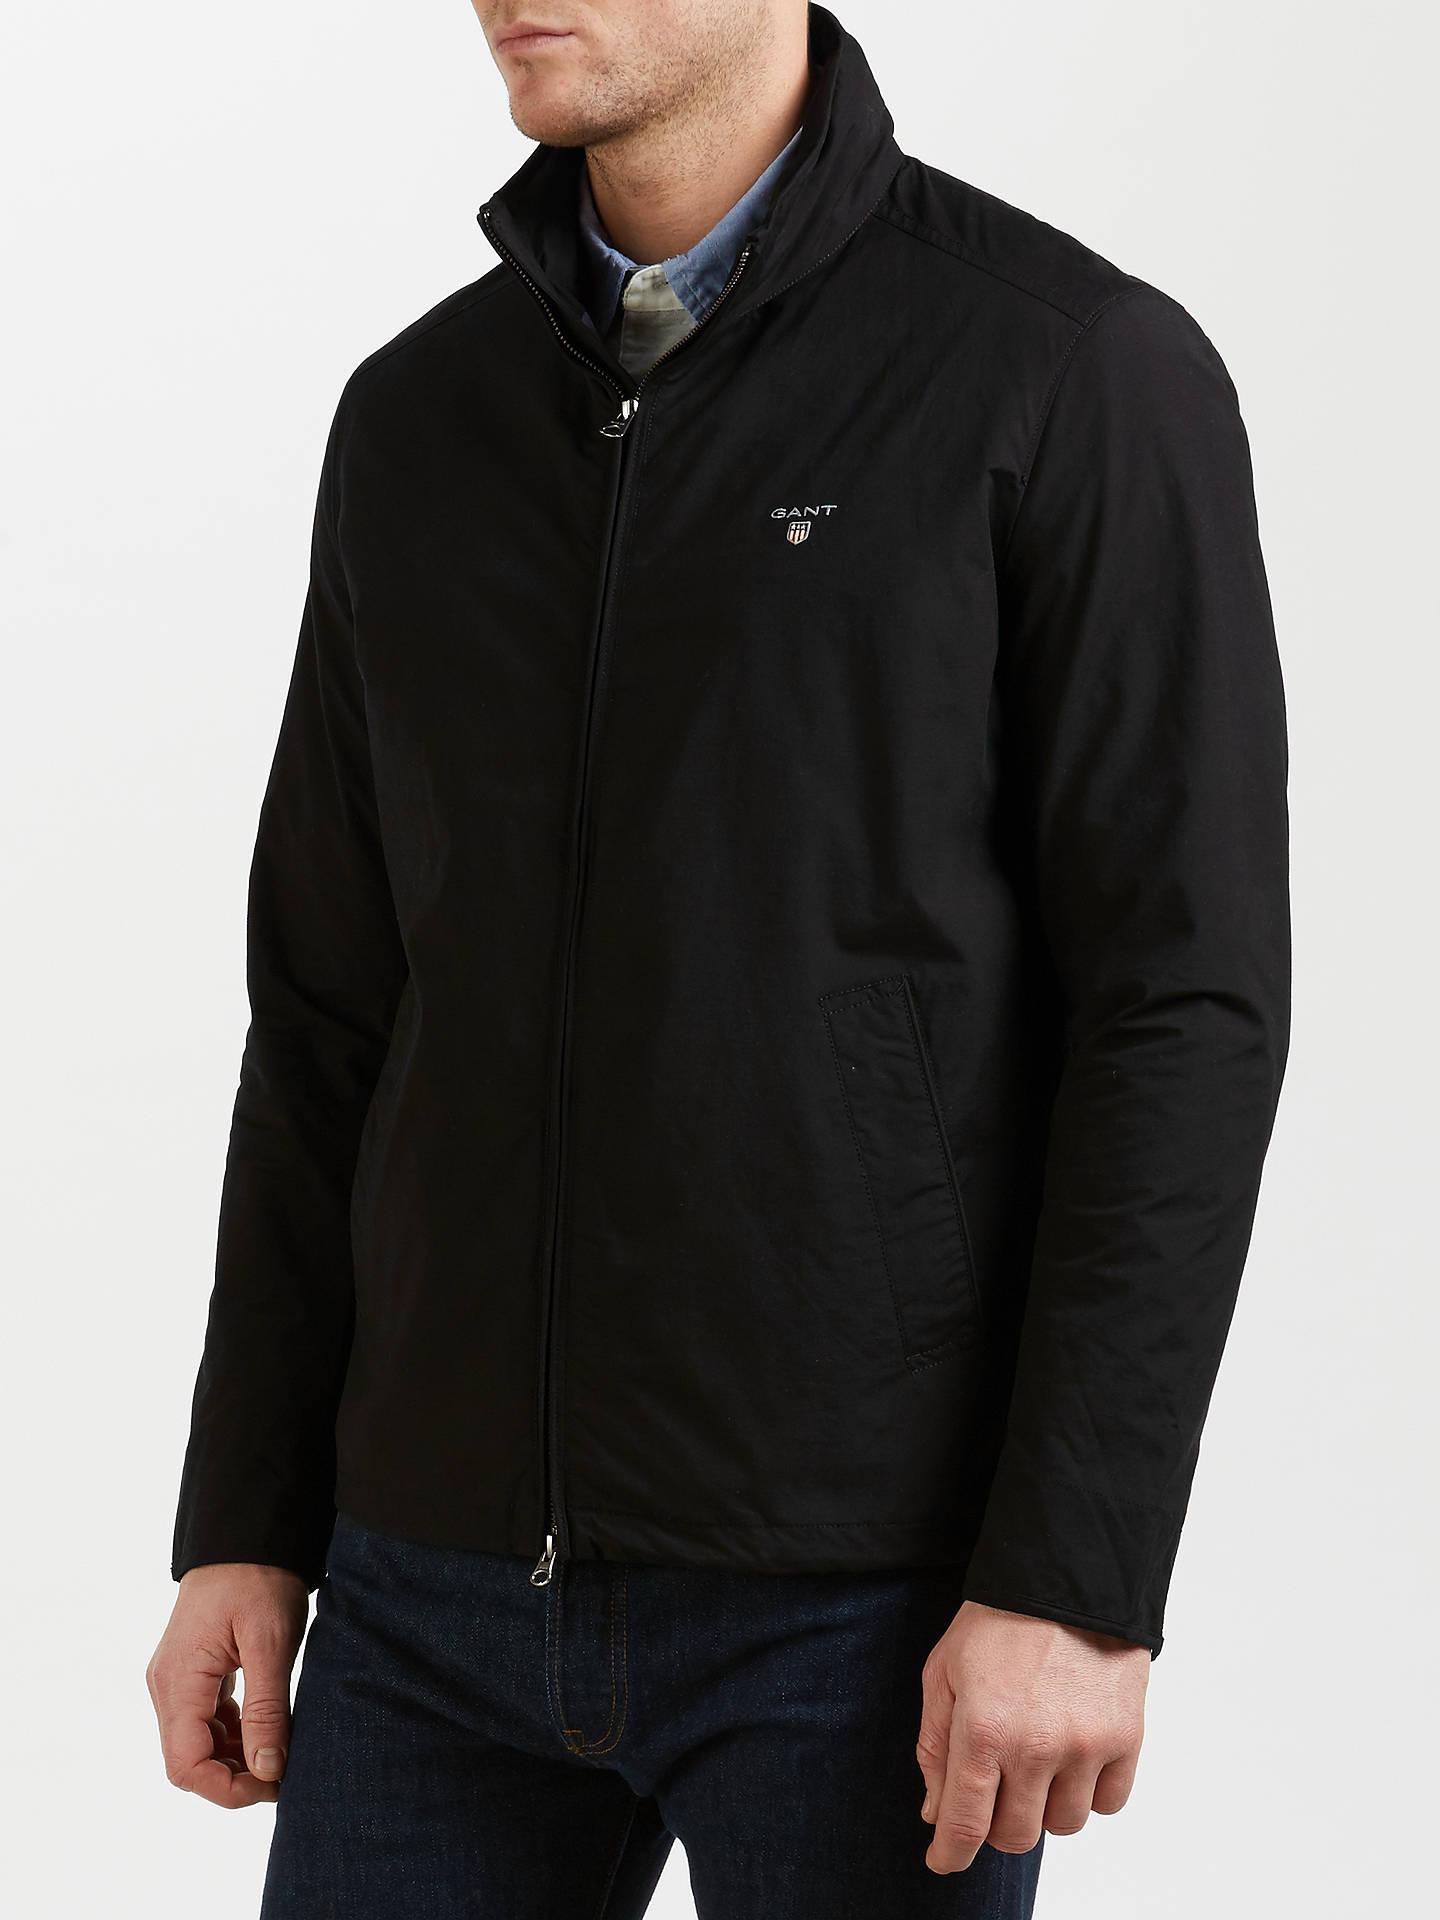 97689c5e00 ... Buy Gant Mid-Length Jacket, Black, S Online at johnlewis.com